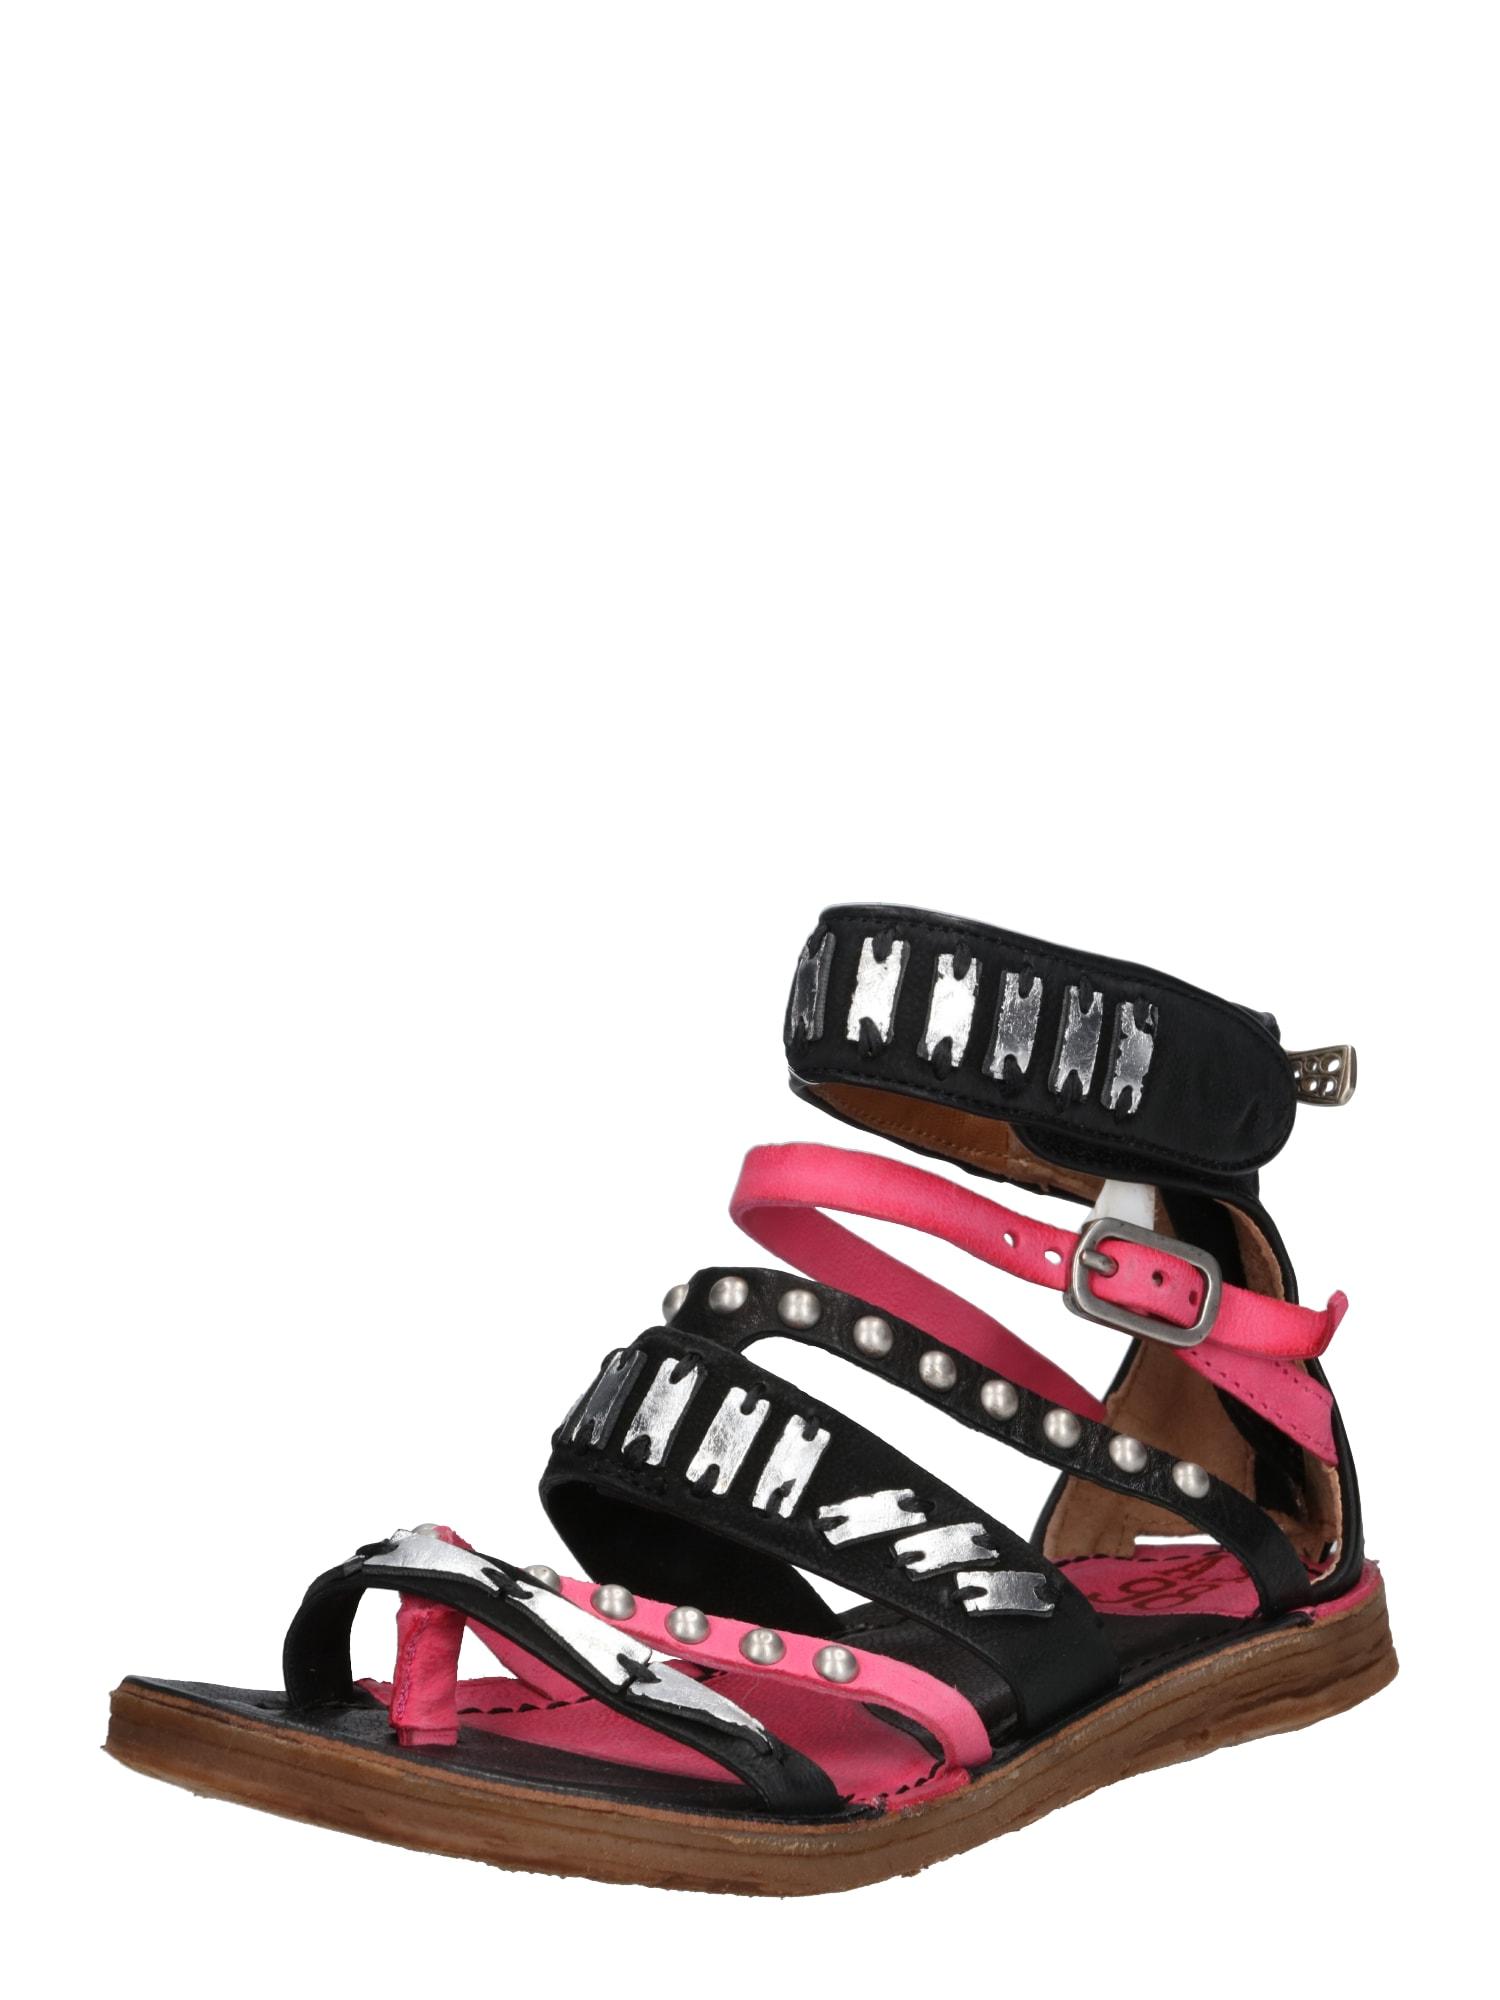 Páskové sandály Ramos pink černá A.S.98